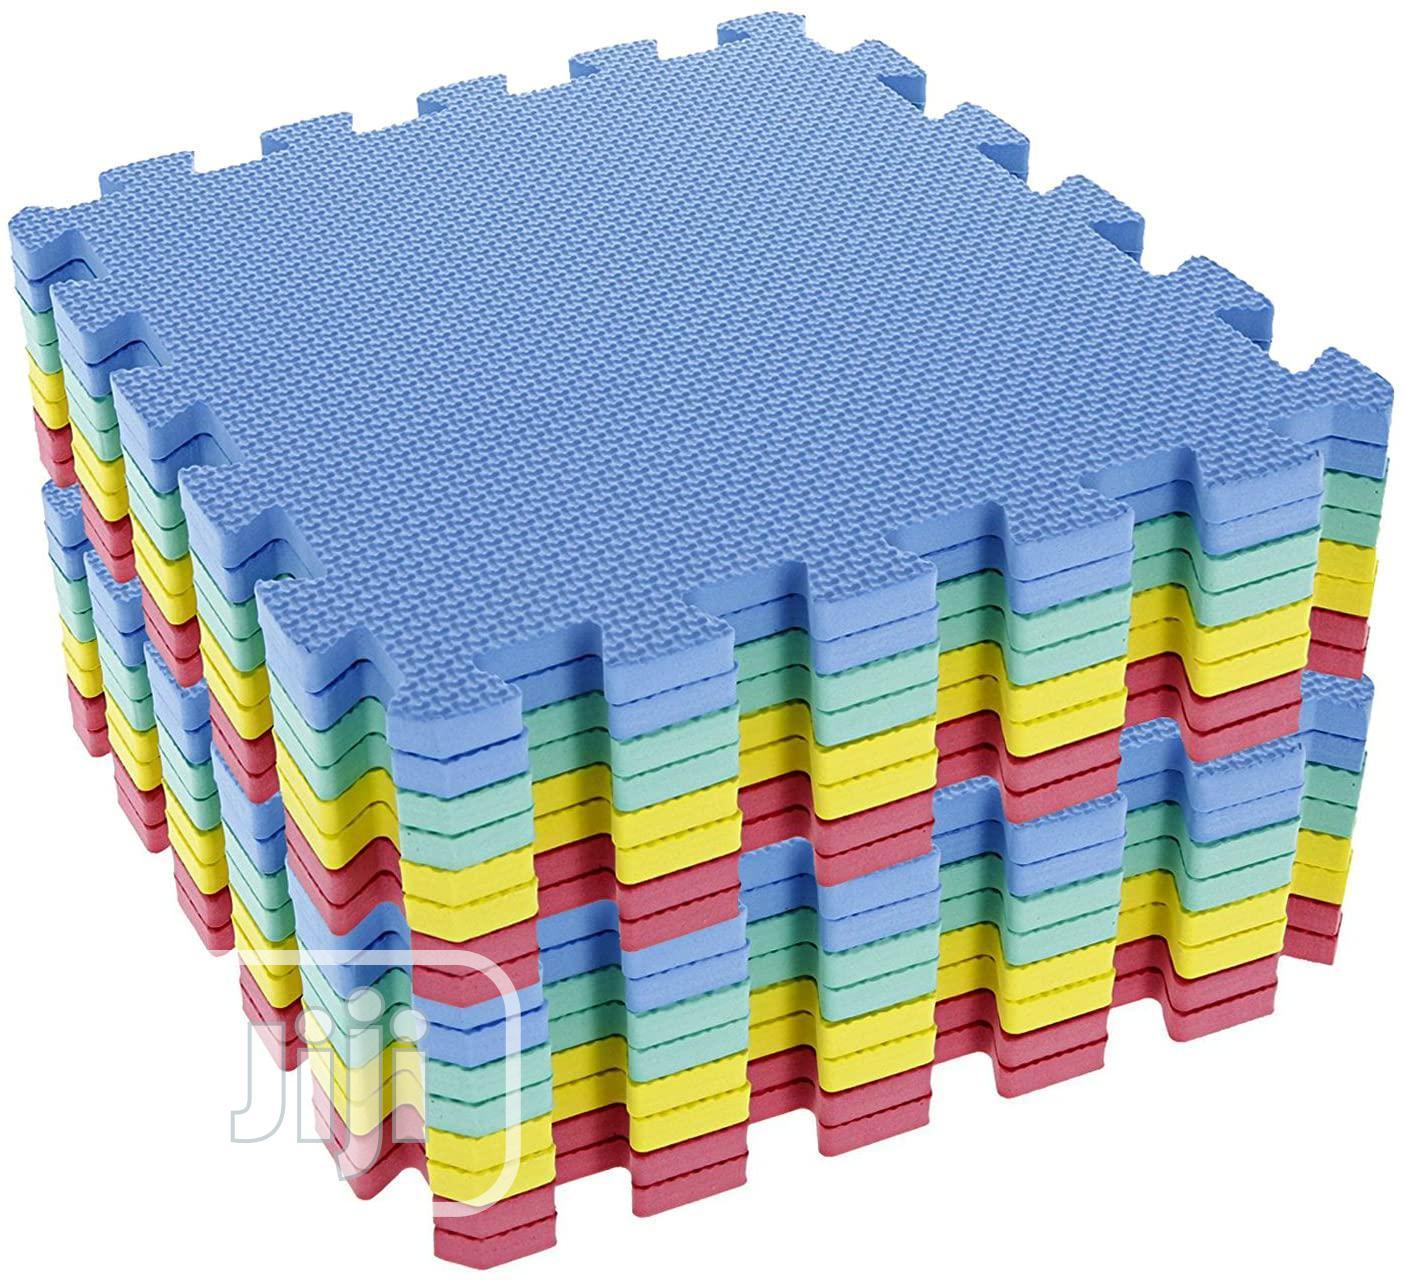 Interlocking Soft Kids Baby EVA Foam Activity Play Mat Floor